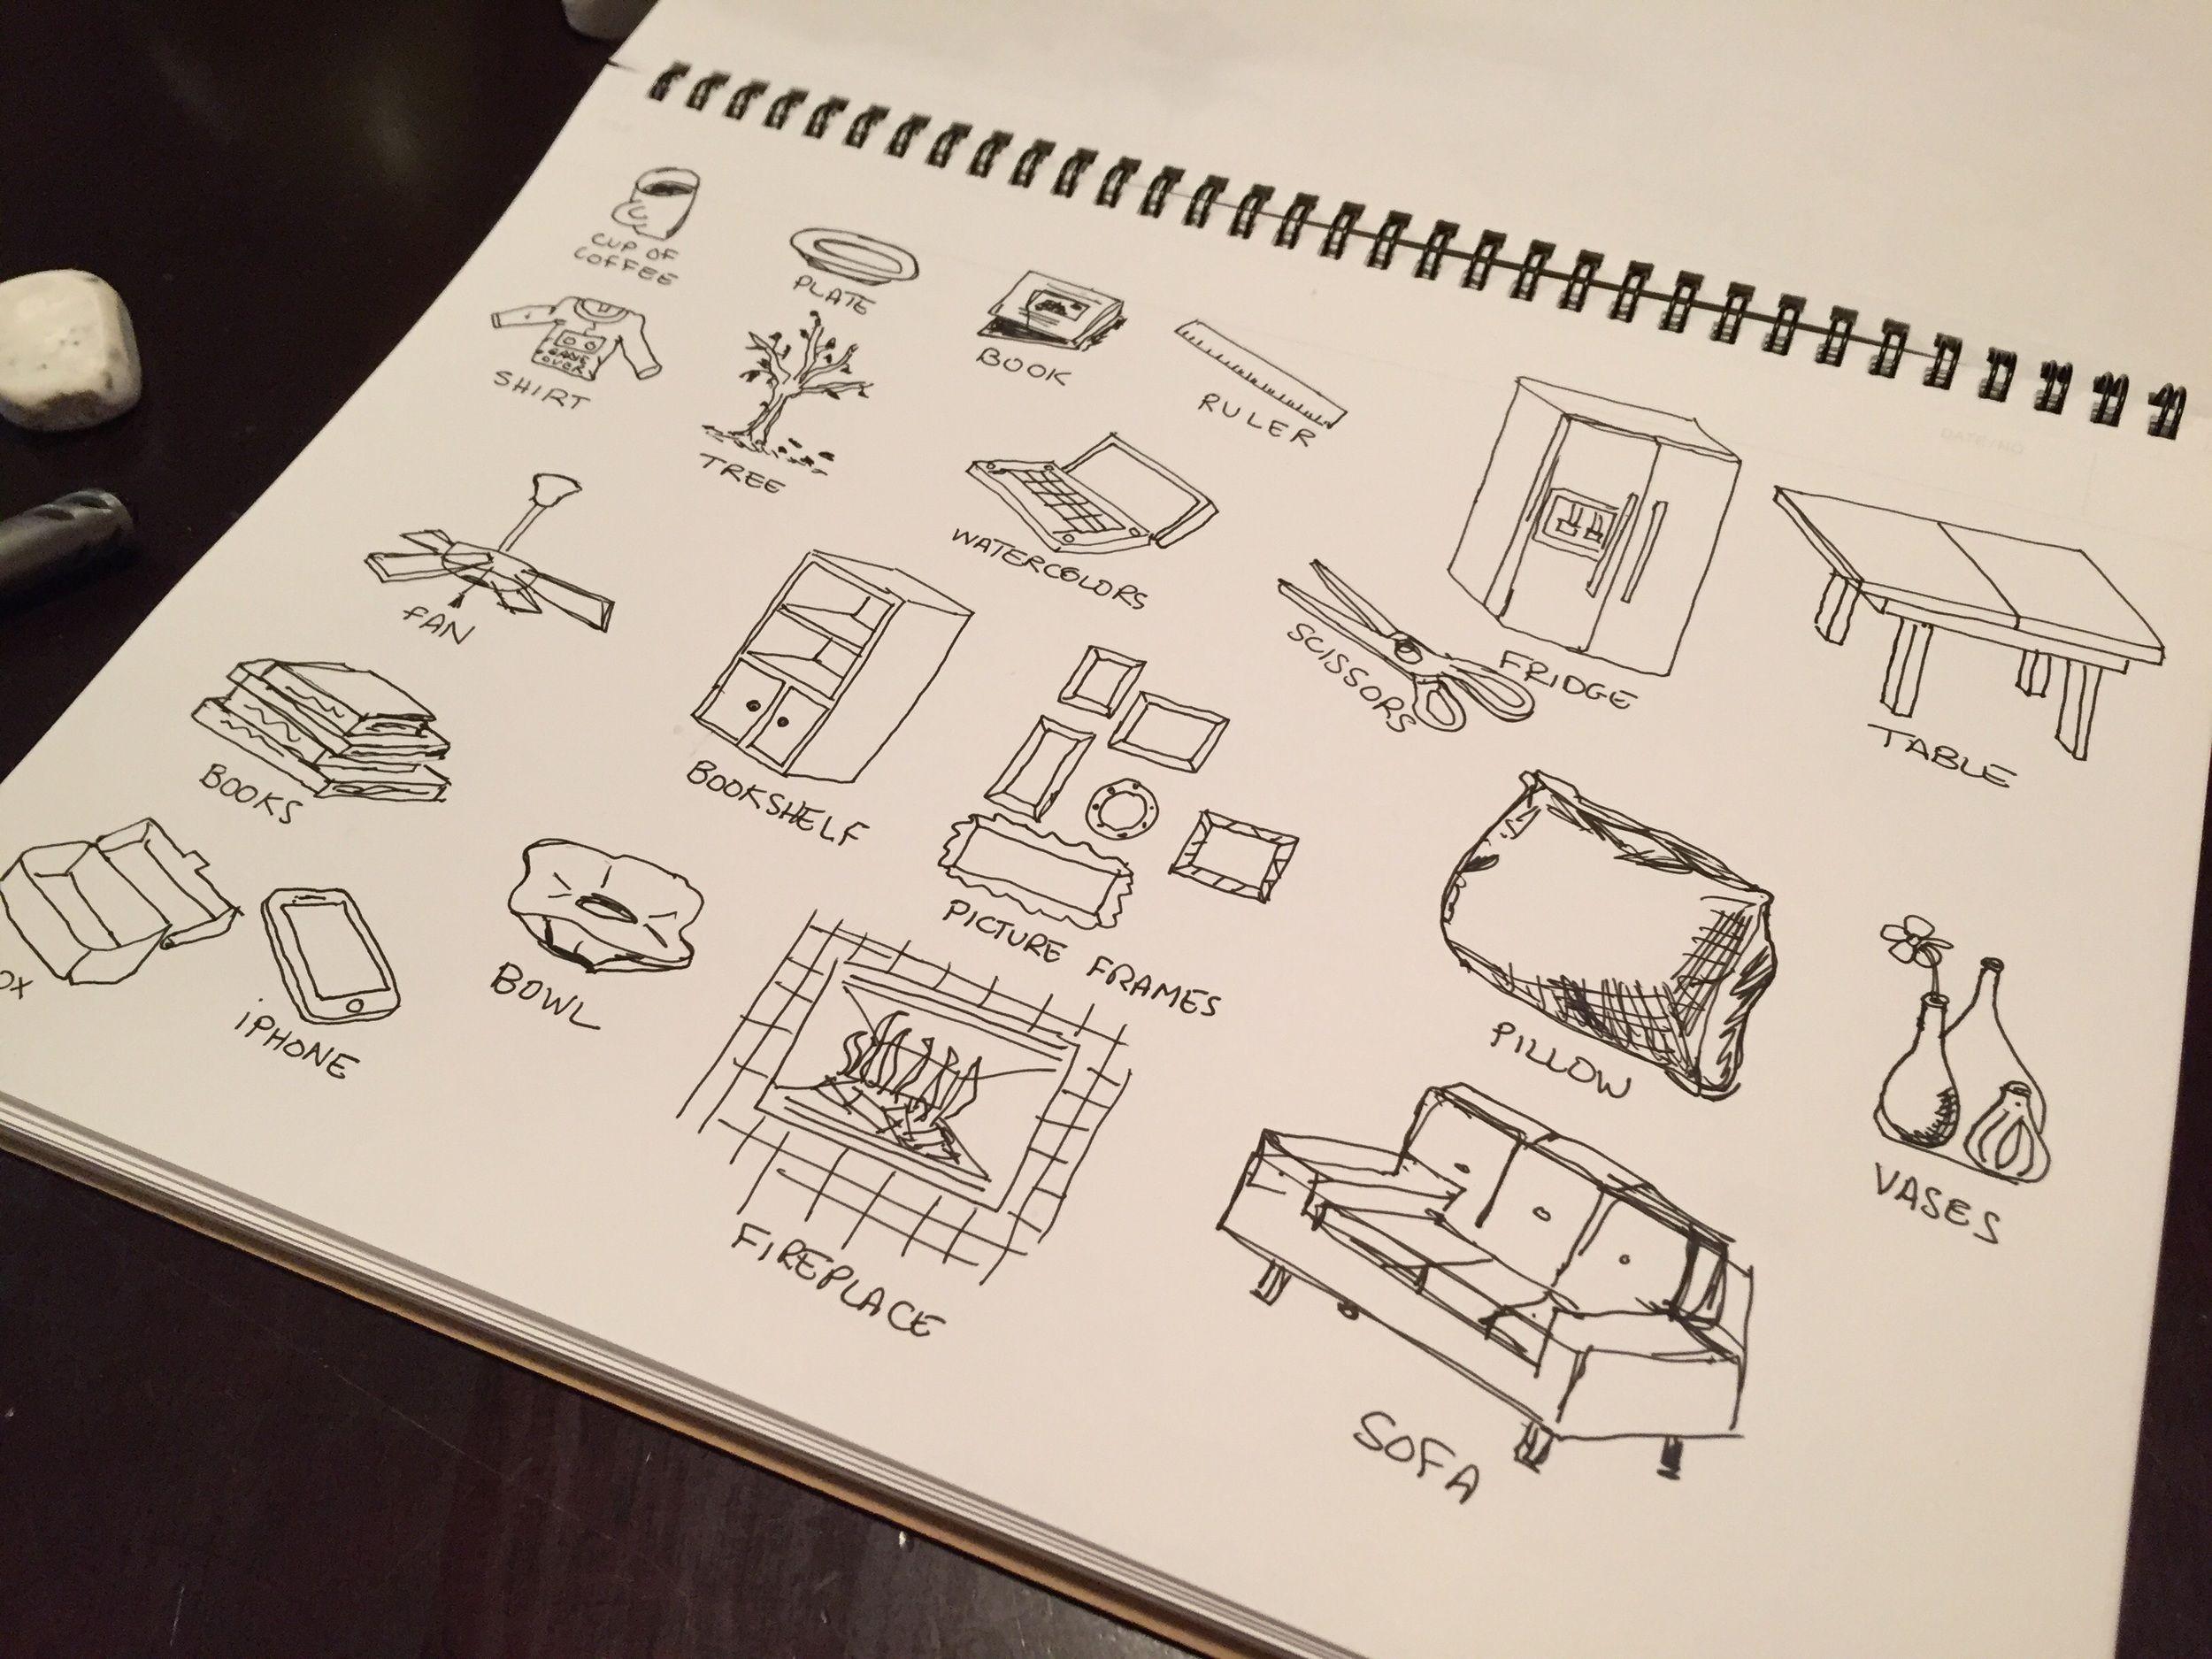 objects-compressor.jpg